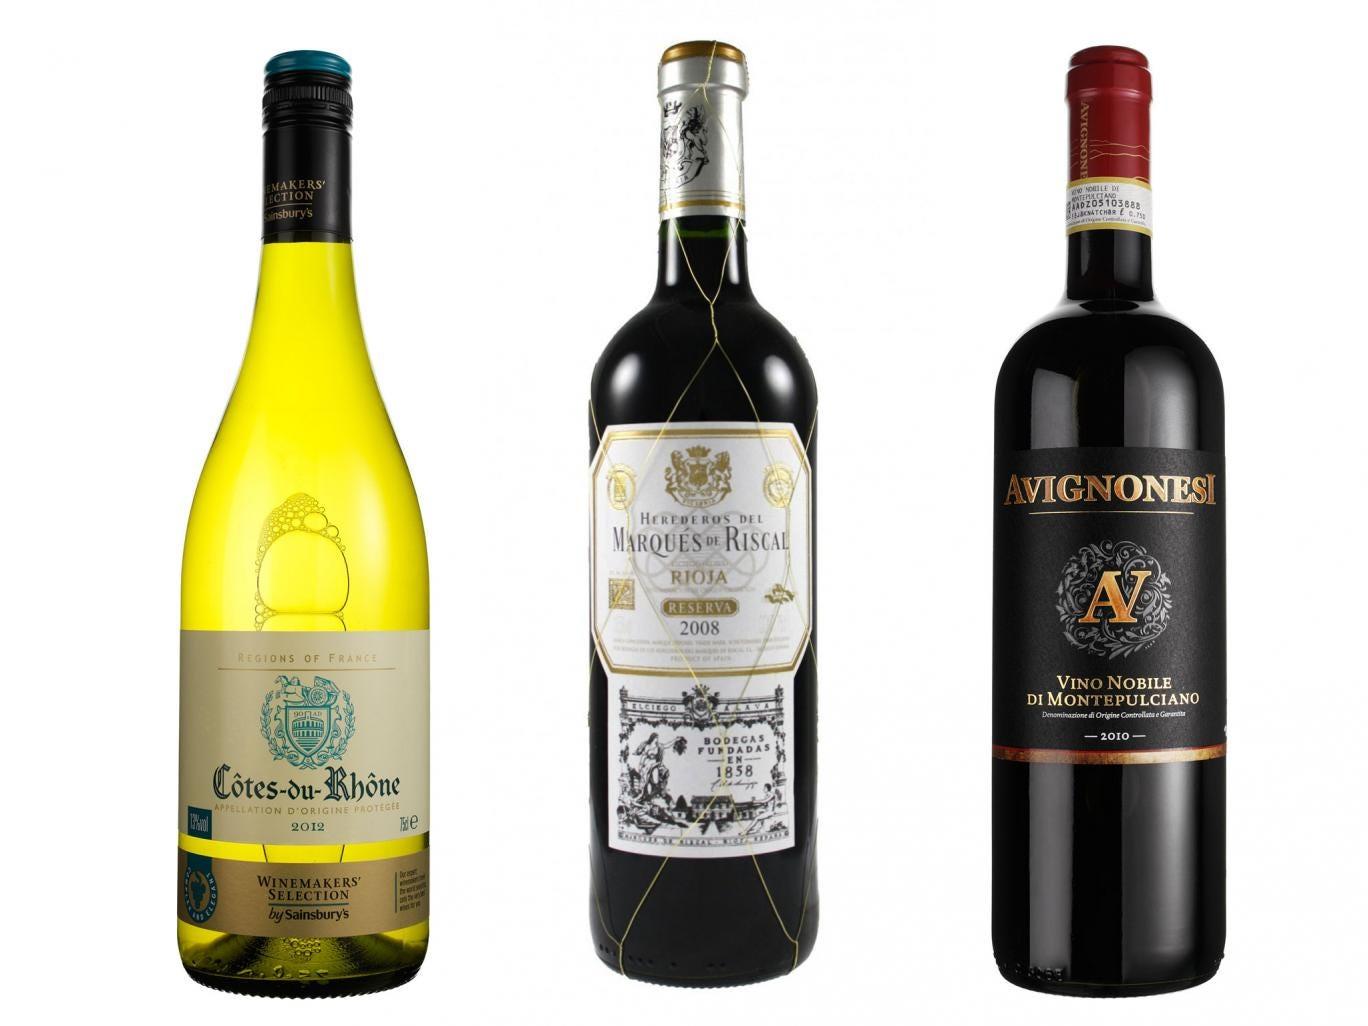 2012 Taste the Difference Côtes du Rhone Villages; 2008 Marques de Riscal Rioja Reserva; 2010 Avignonesi Vino Nobile